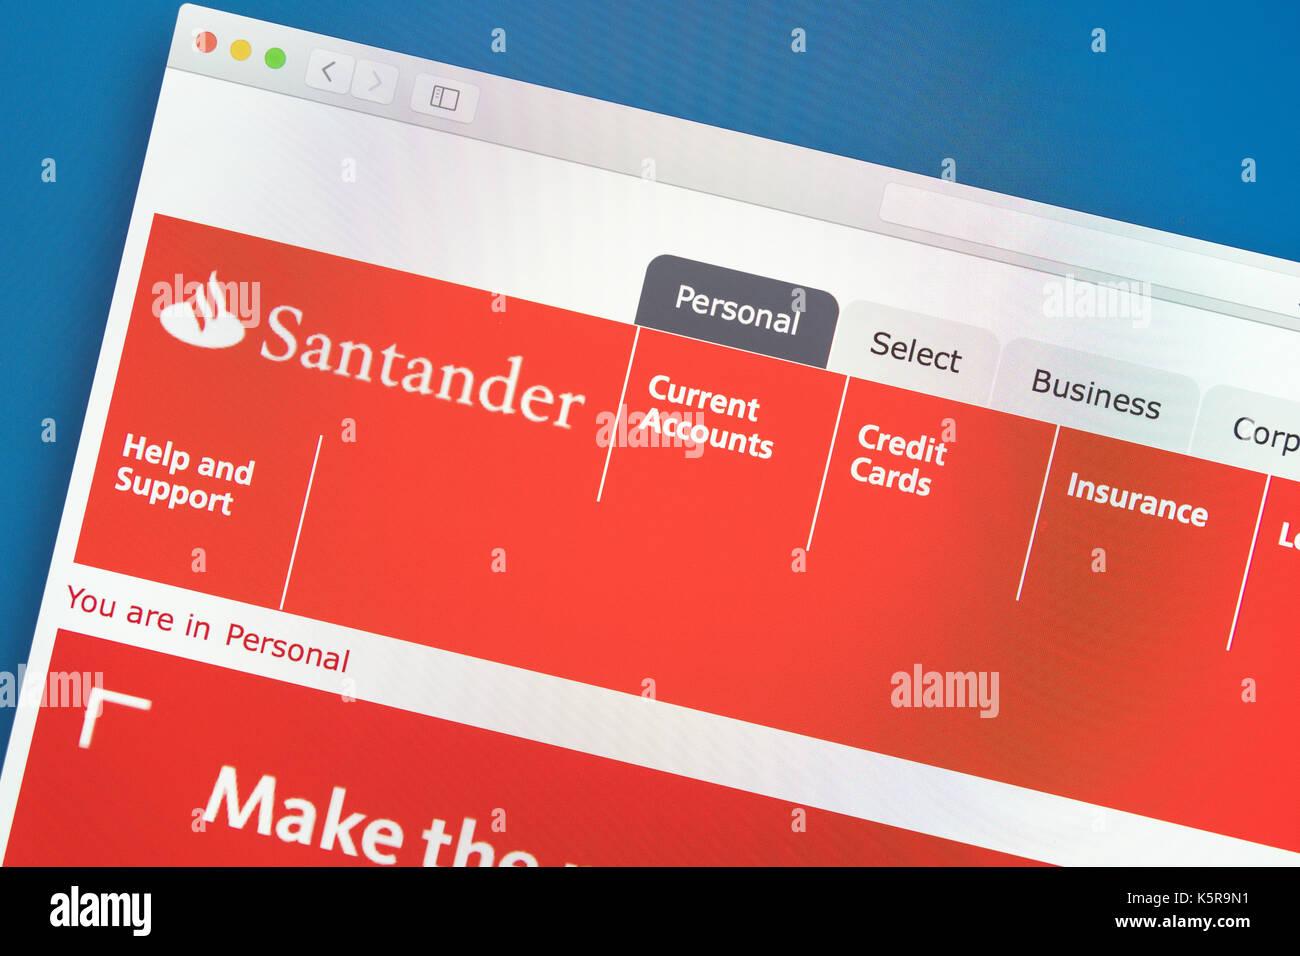 Santander bank website  Santander logo Stock Photo: 158479133 - Alamy